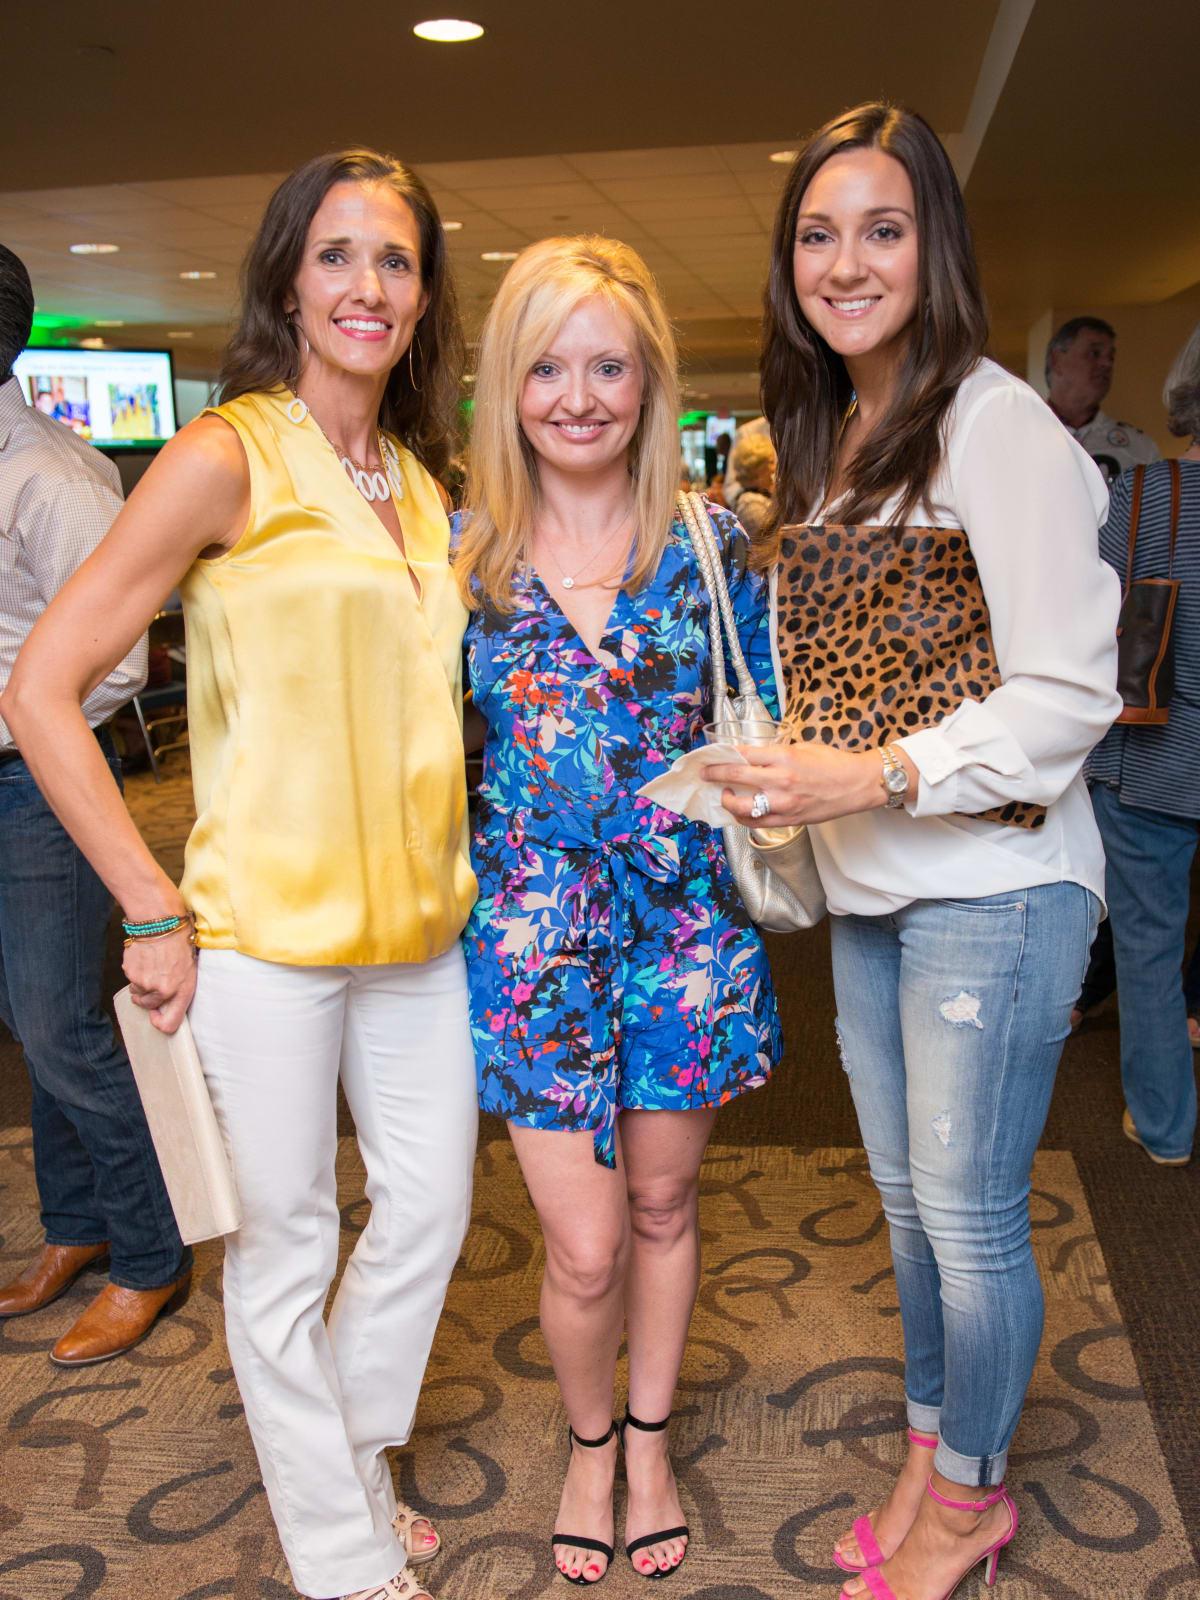 Fantasy Football draft 2015 Laura Nelson, Ashley Petersen, Donna Marshall